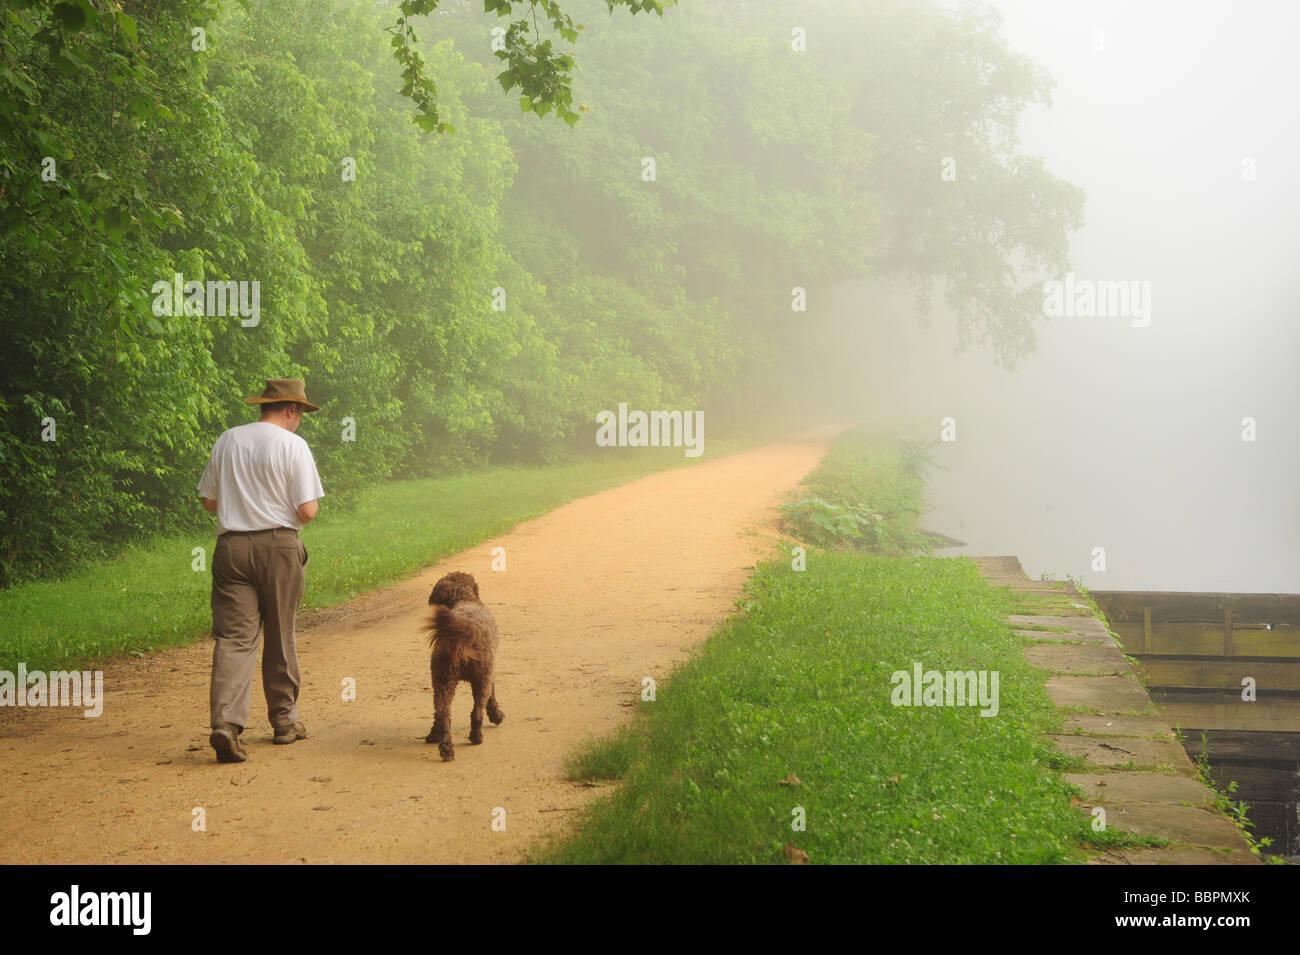 c-o-canal-national-historic-park-marylan